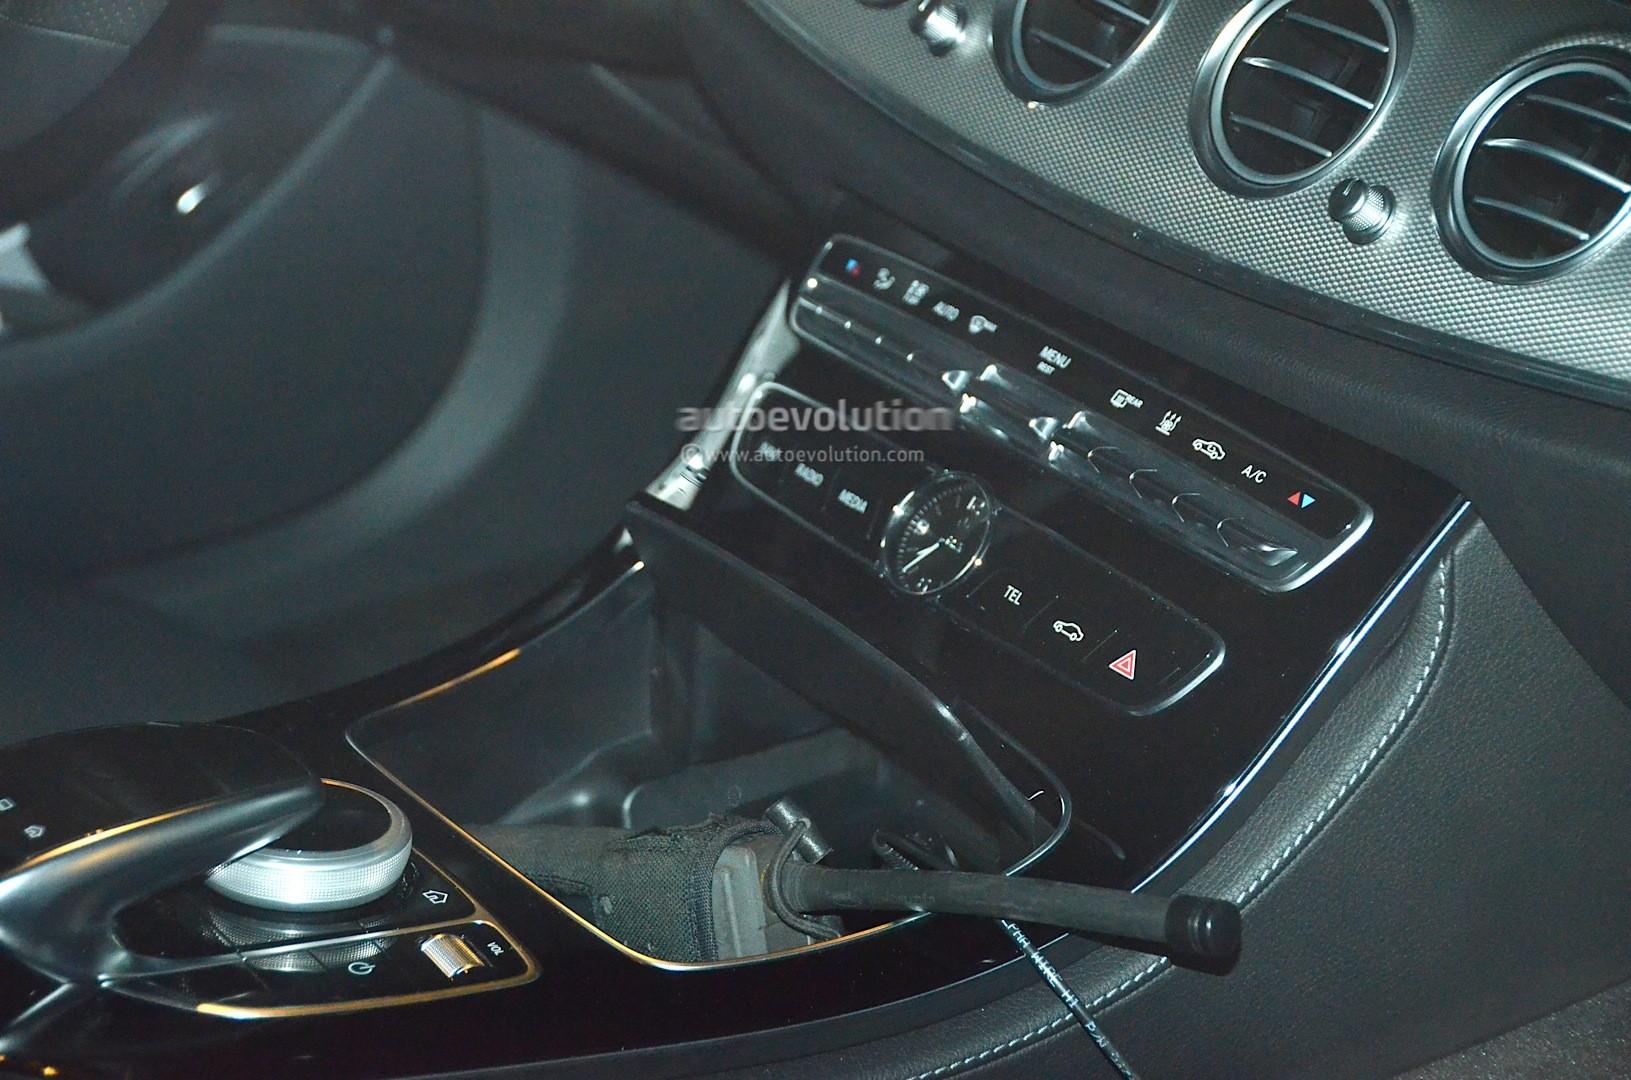 Spyshots 2017 Mercedes Benz E Class Interior Fully Revealed Ahead Of Detroit Debut Autoevolution